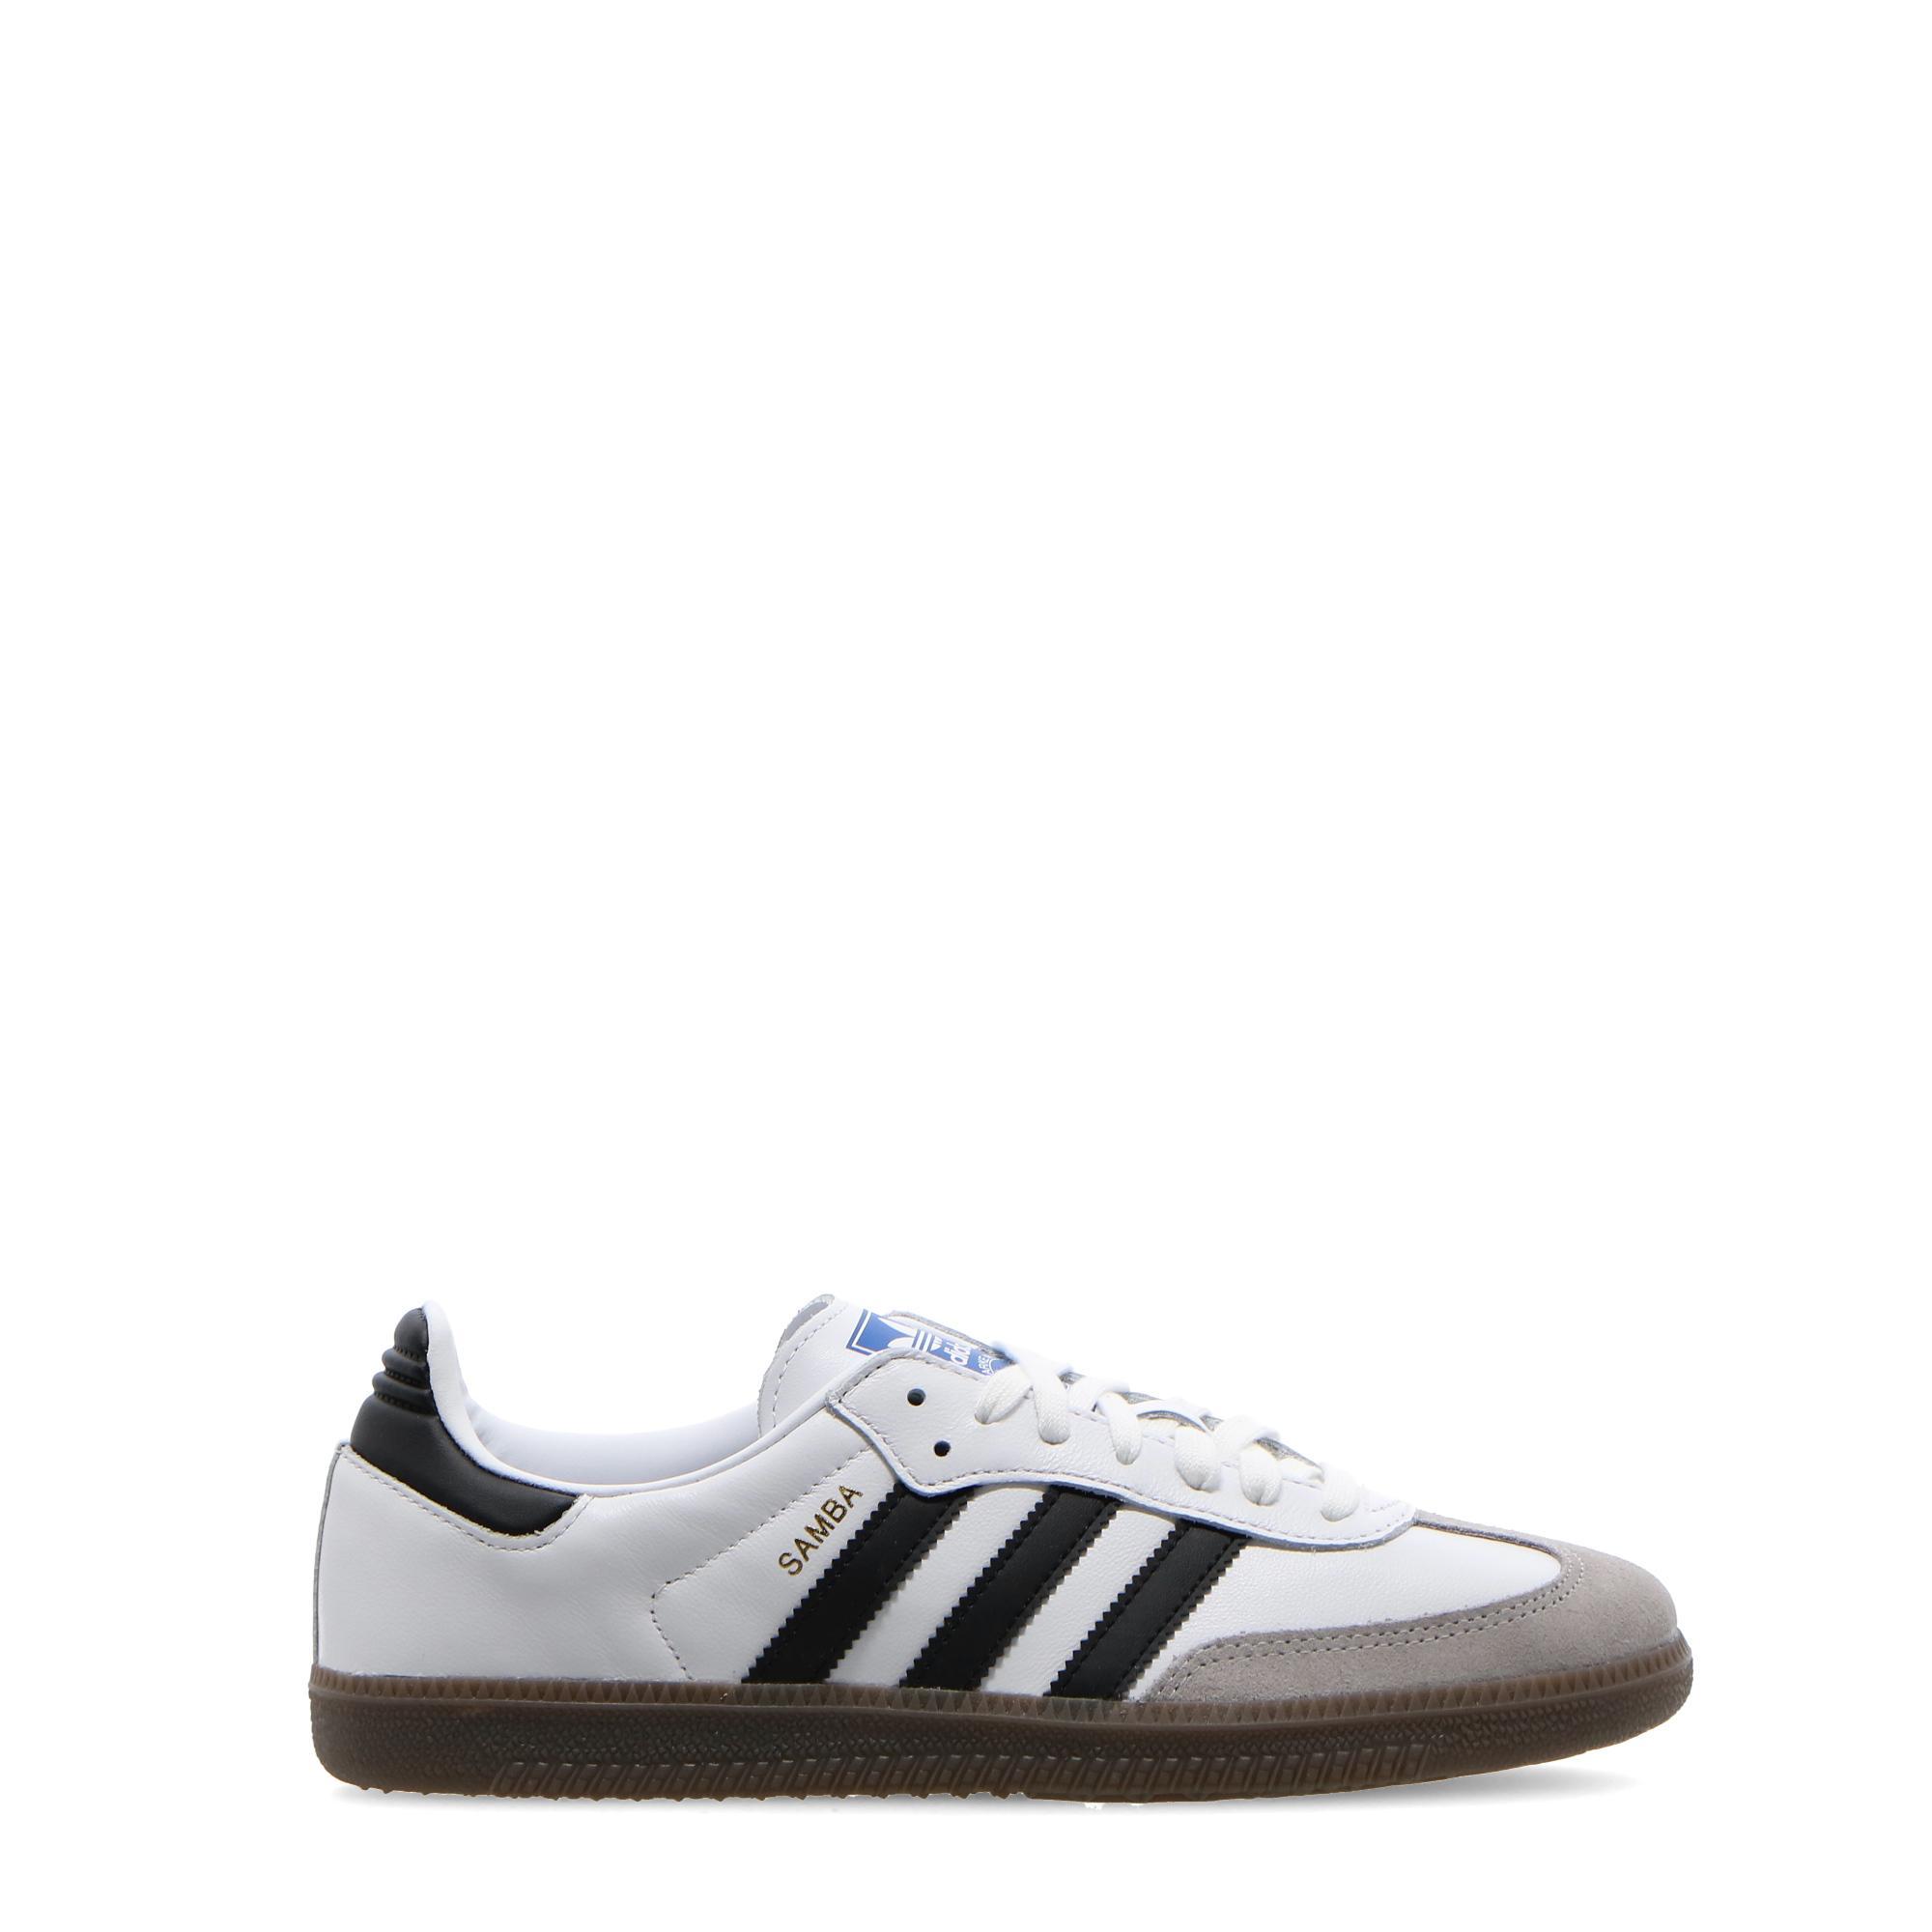 Adidas Samba Og White black granite